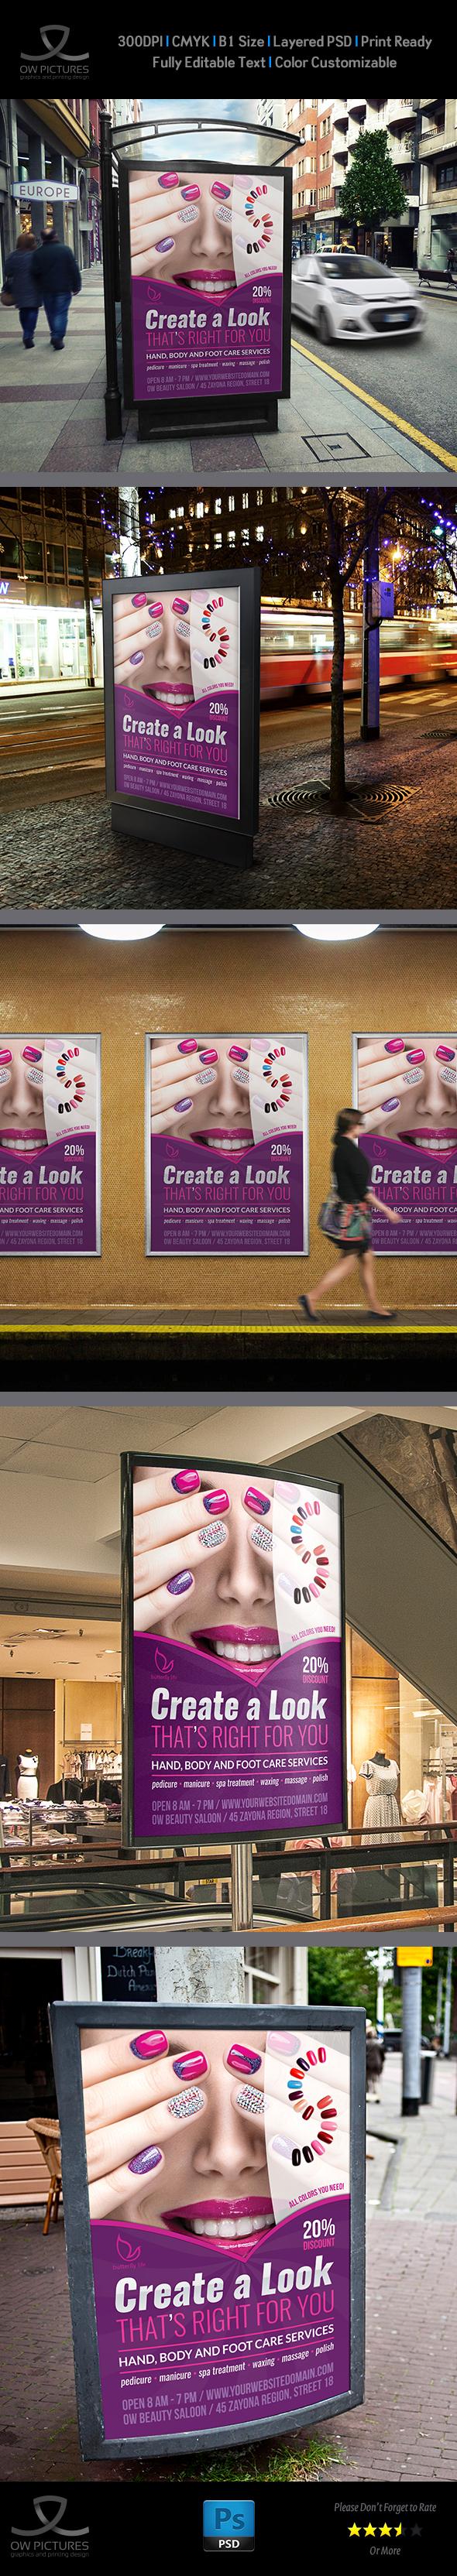 nail salon poster template on behance